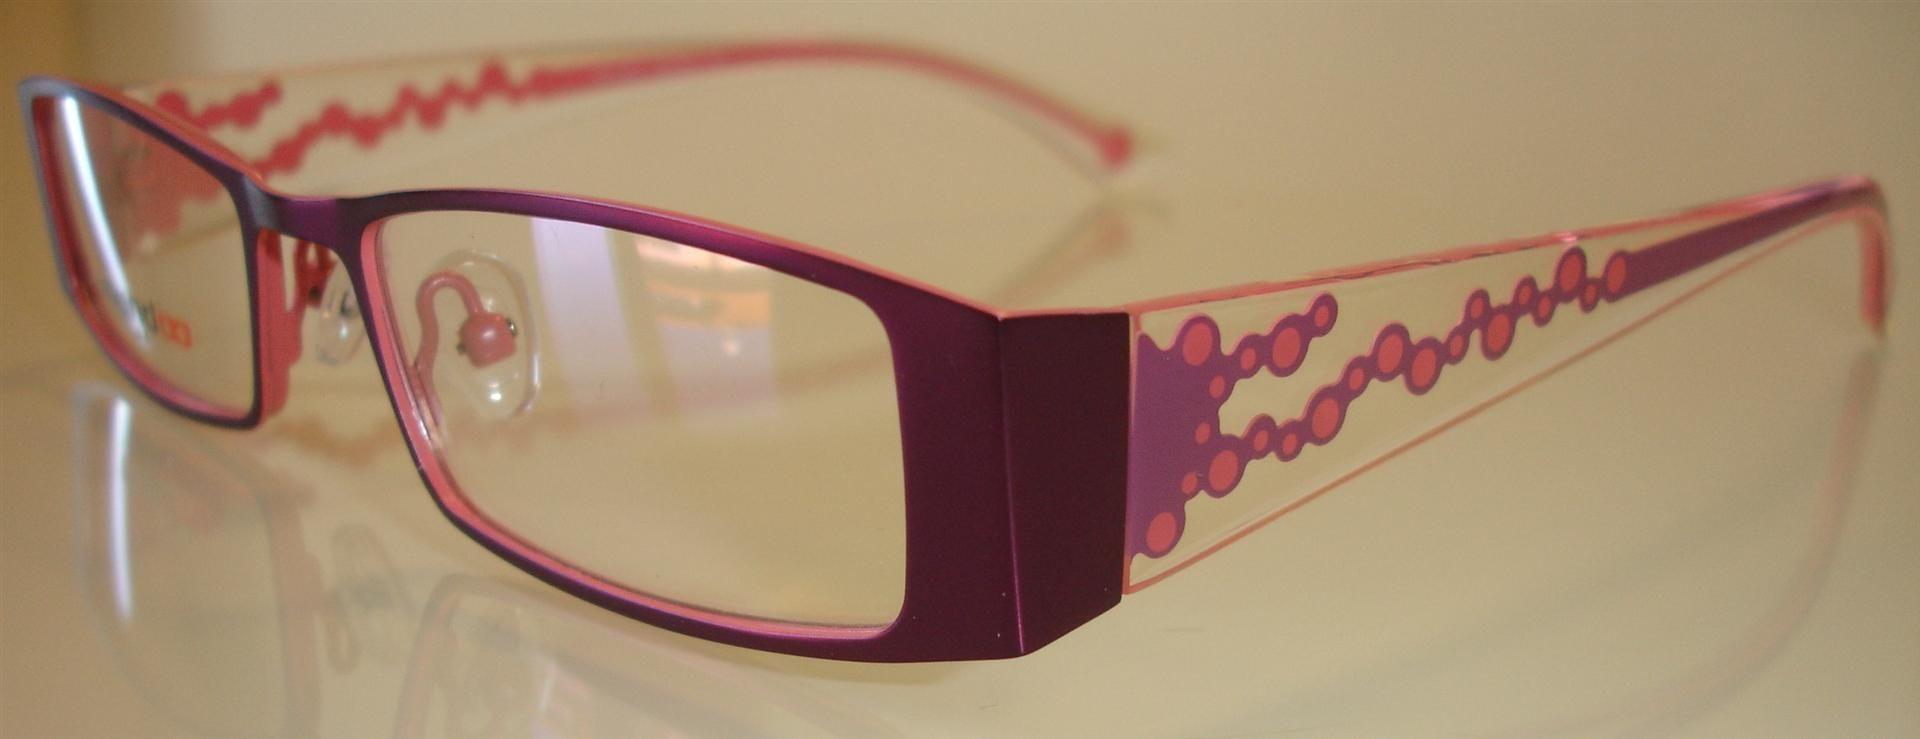 Mondoo Model 5081 Glasses Model Sunglasses